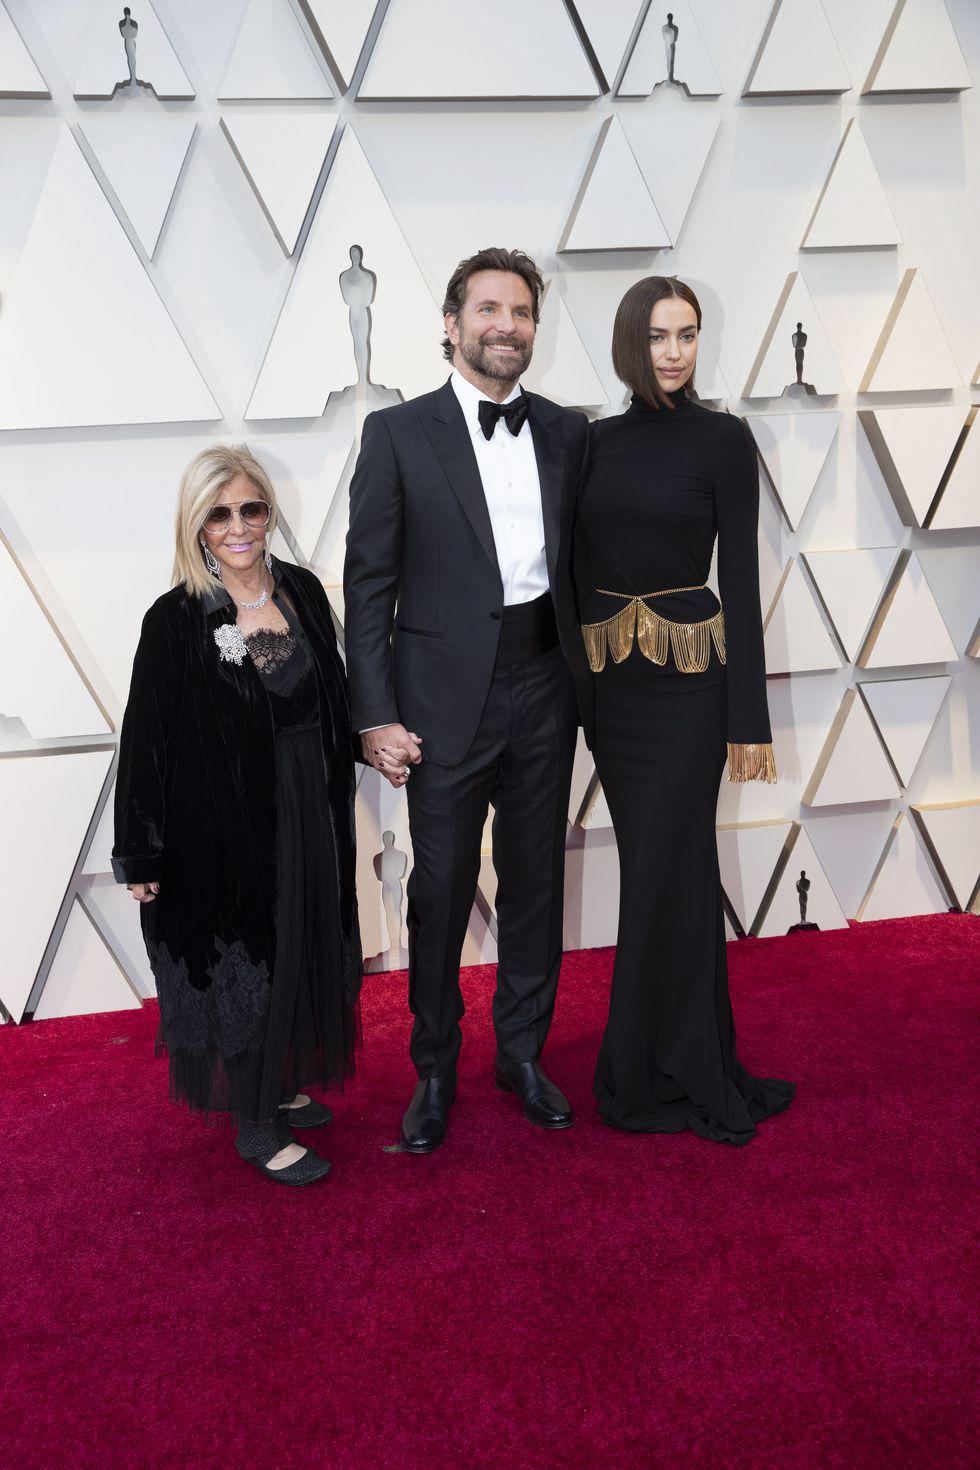 Die besten Oscar Looks 2019: Bradley Cooper